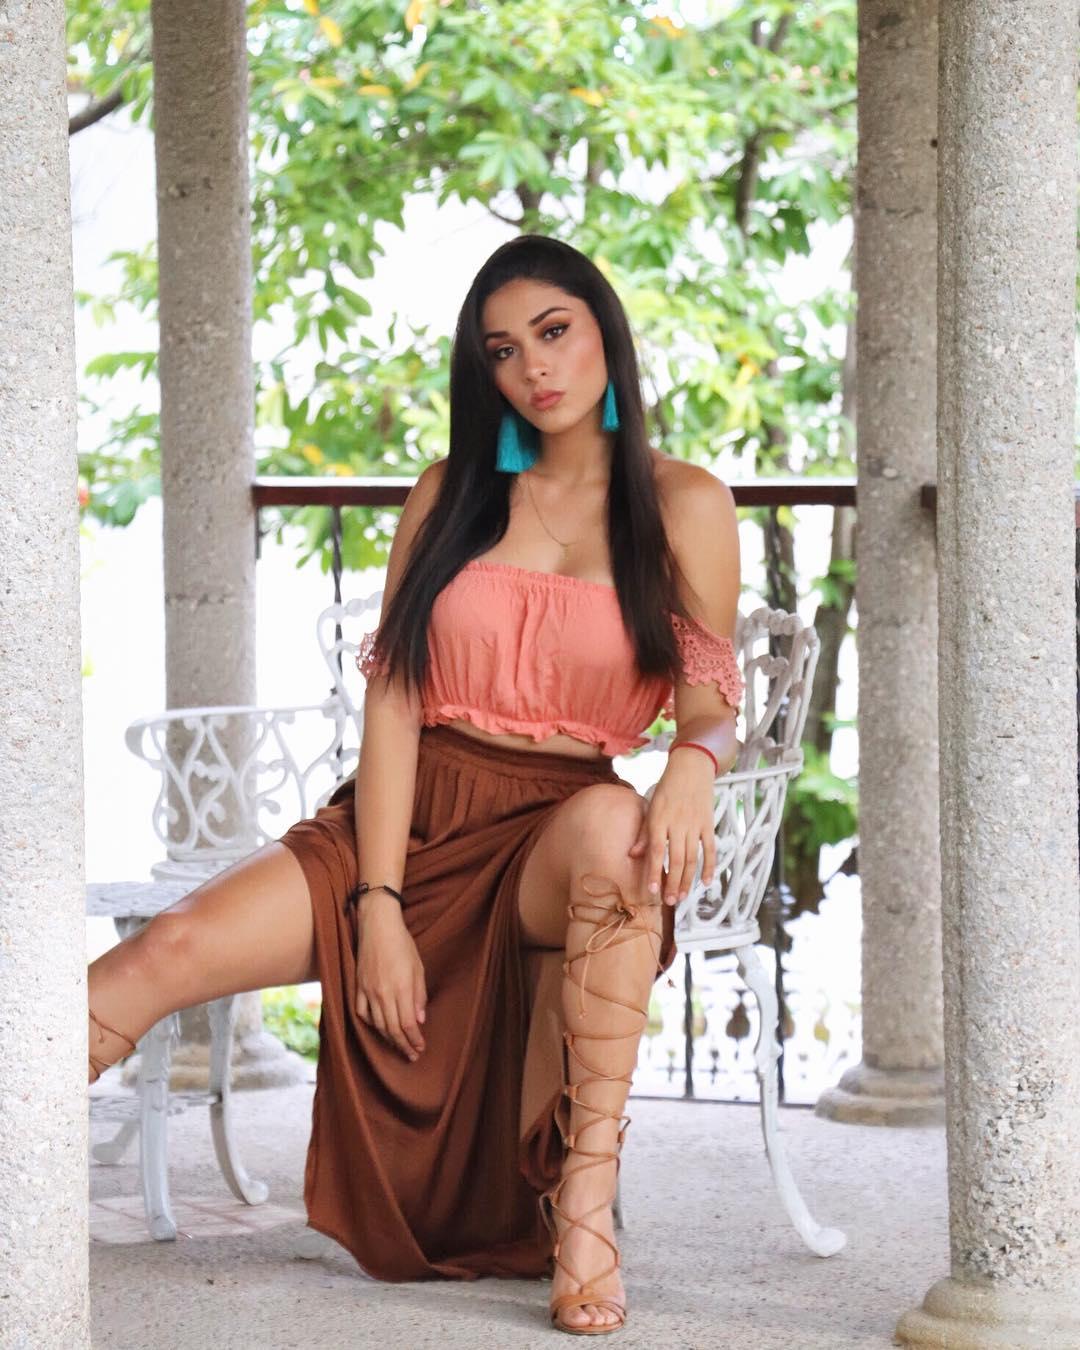 ivanna lobato barradas, top 20 de miss intercontinental 2018-2019. Aefcc610